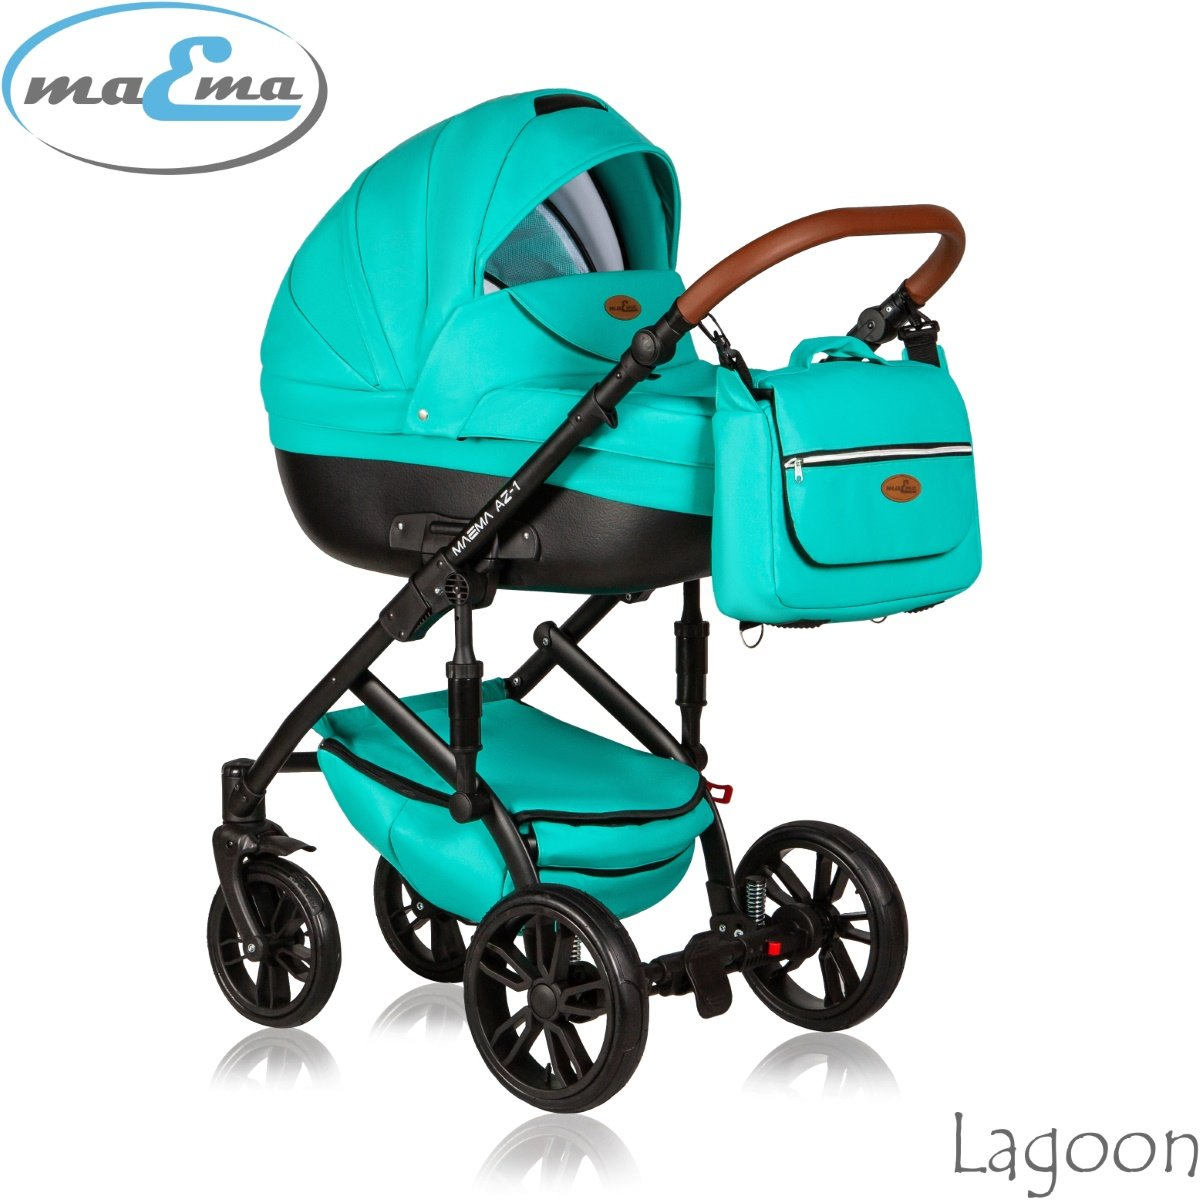 Maema AZ1 Lagoon Bērnu rati 3in1